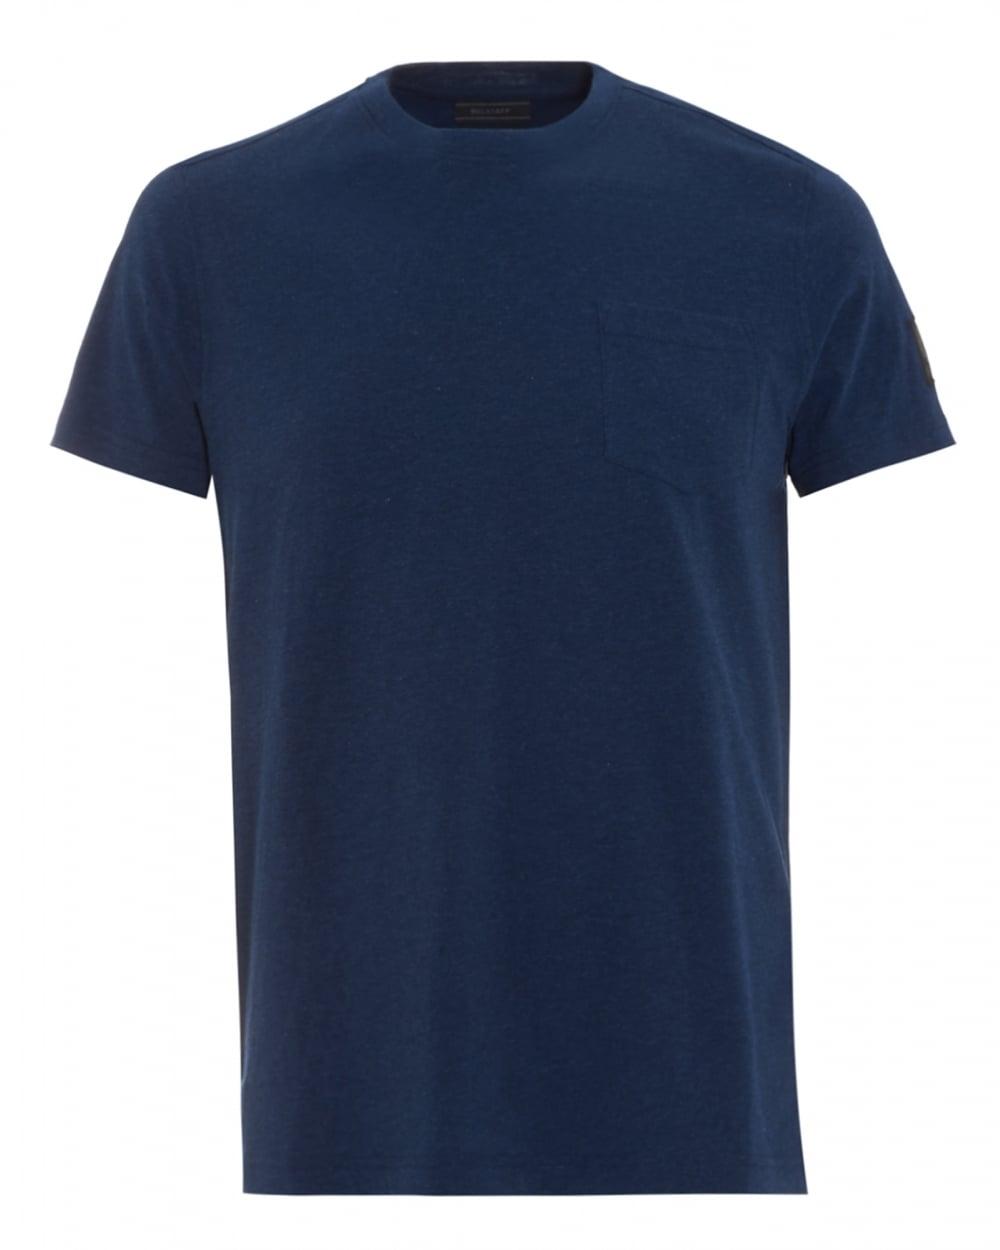 Belstaff Mens New Thom T-Shirt, Plain Navy Blue Bright ...